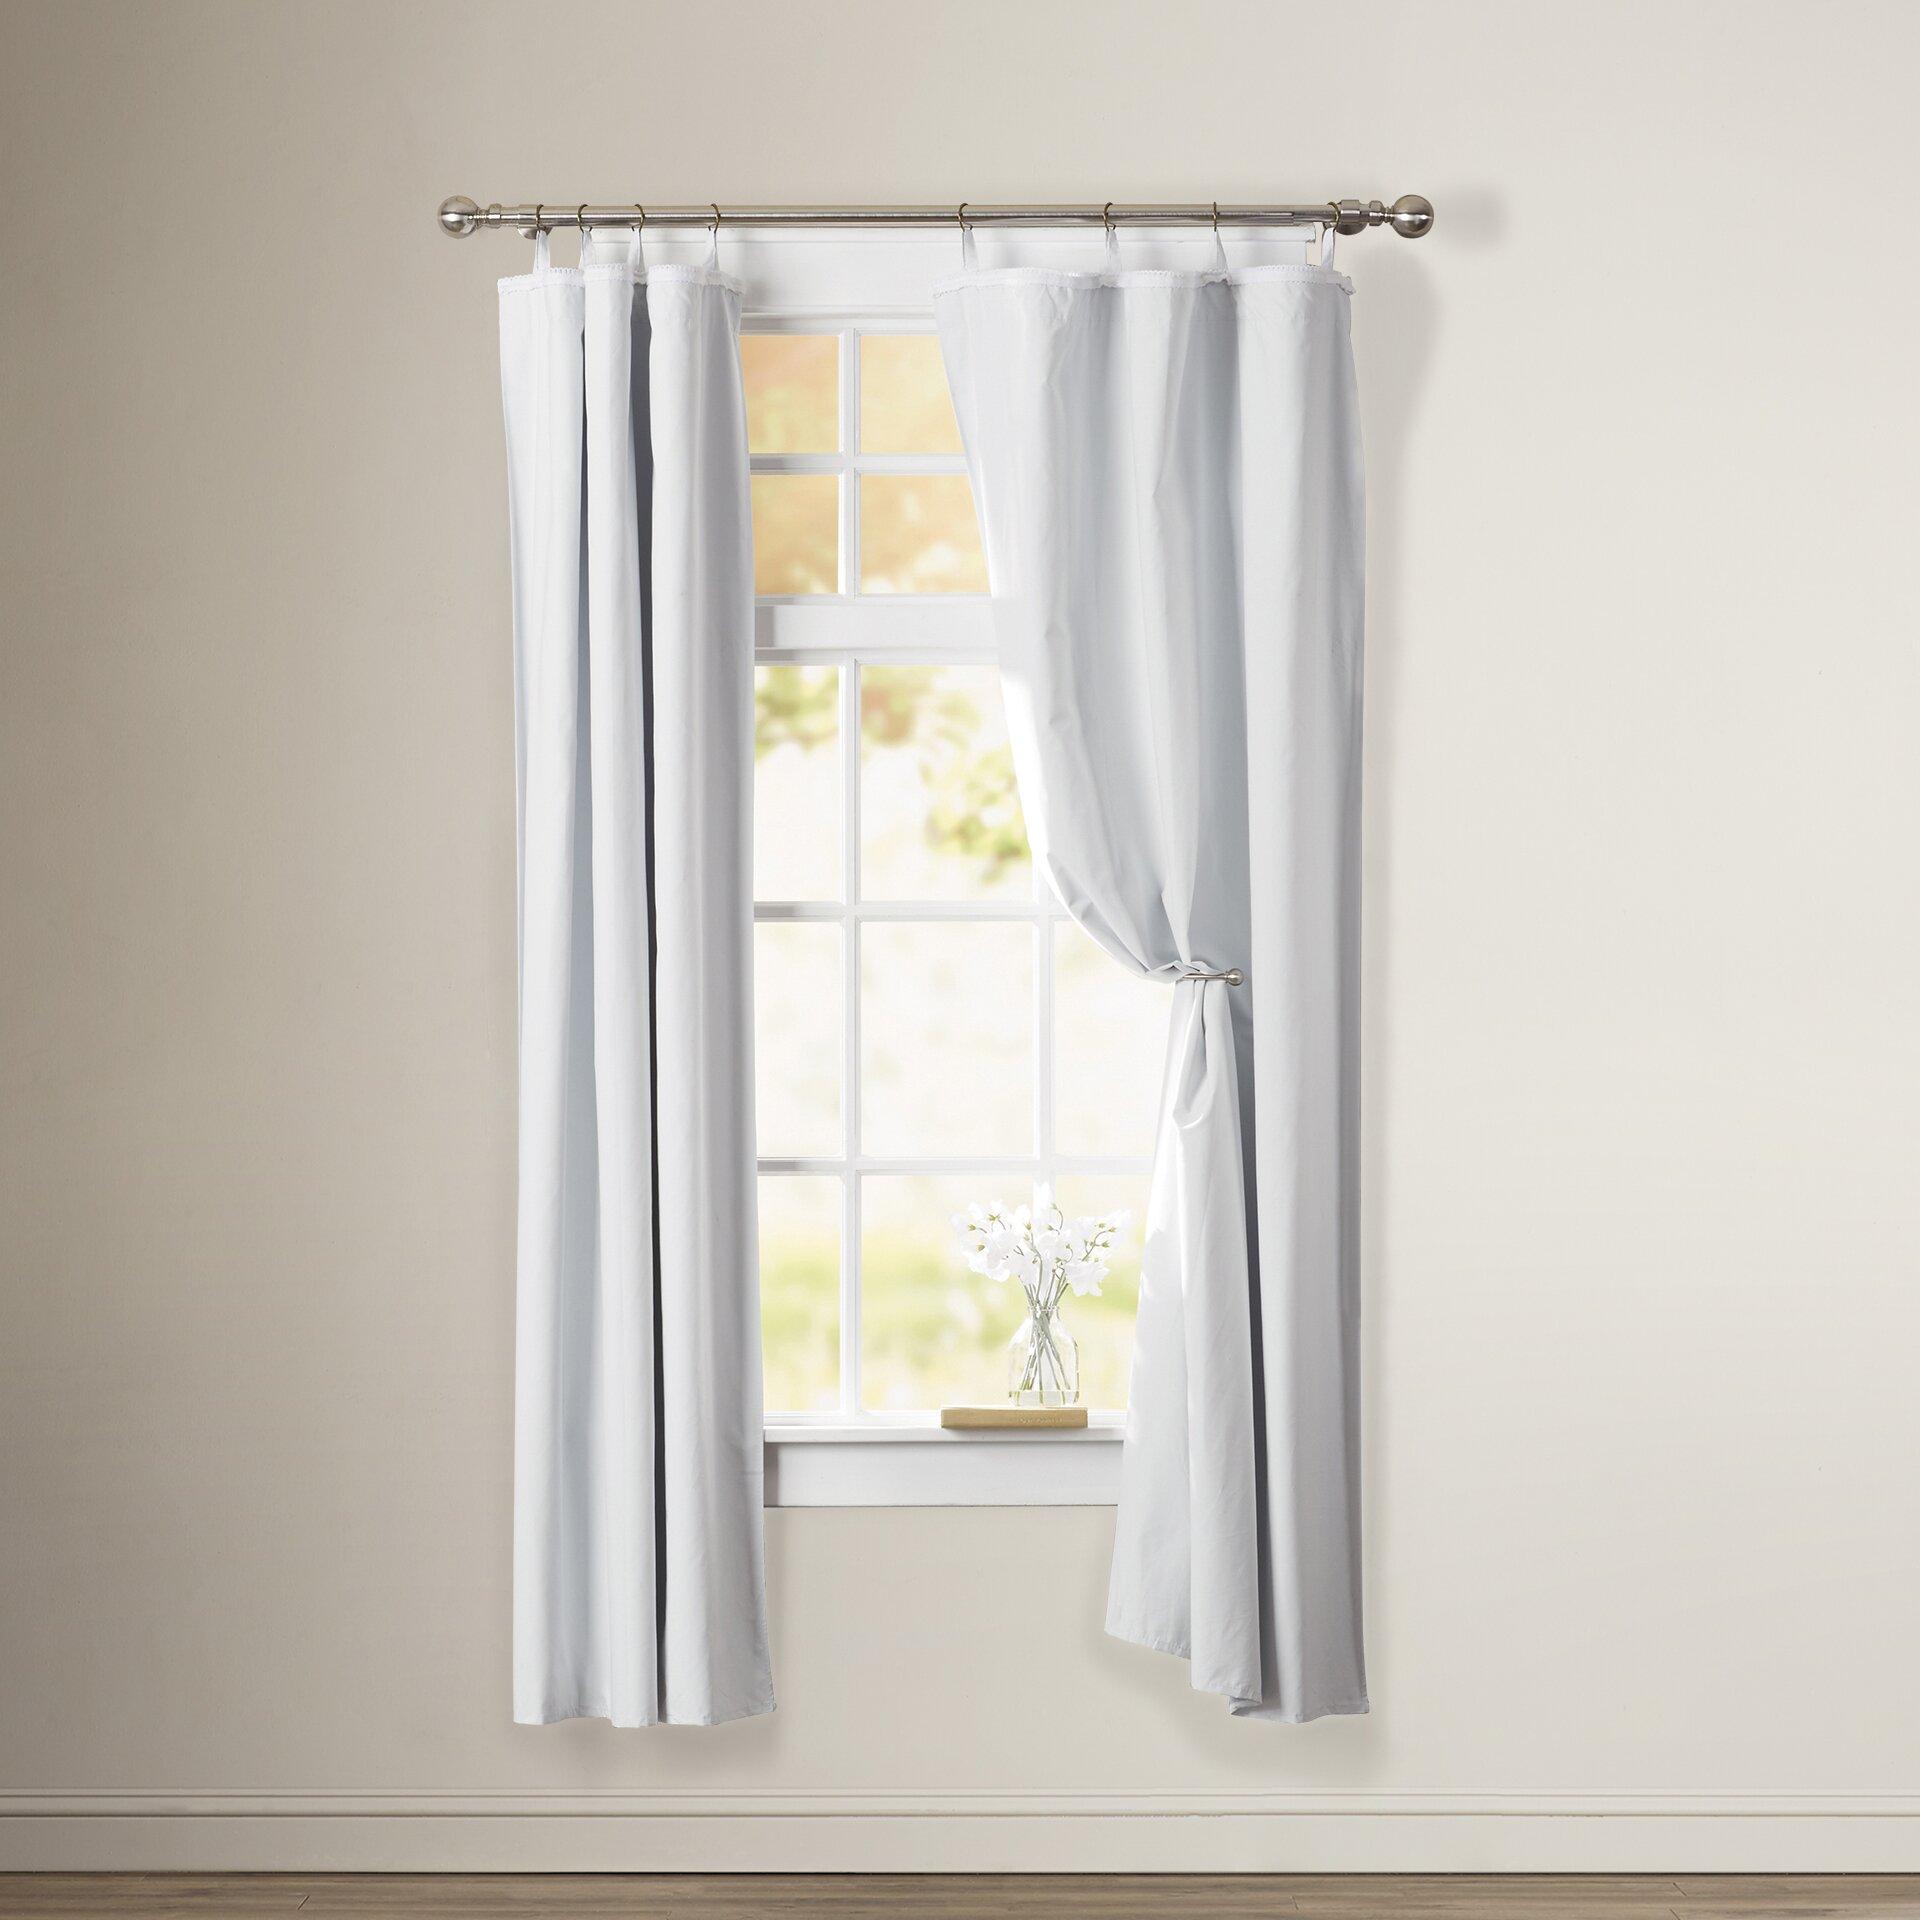 Alcott Hill Dorset Solid Blackout Thermal Grommet Curtain Liner